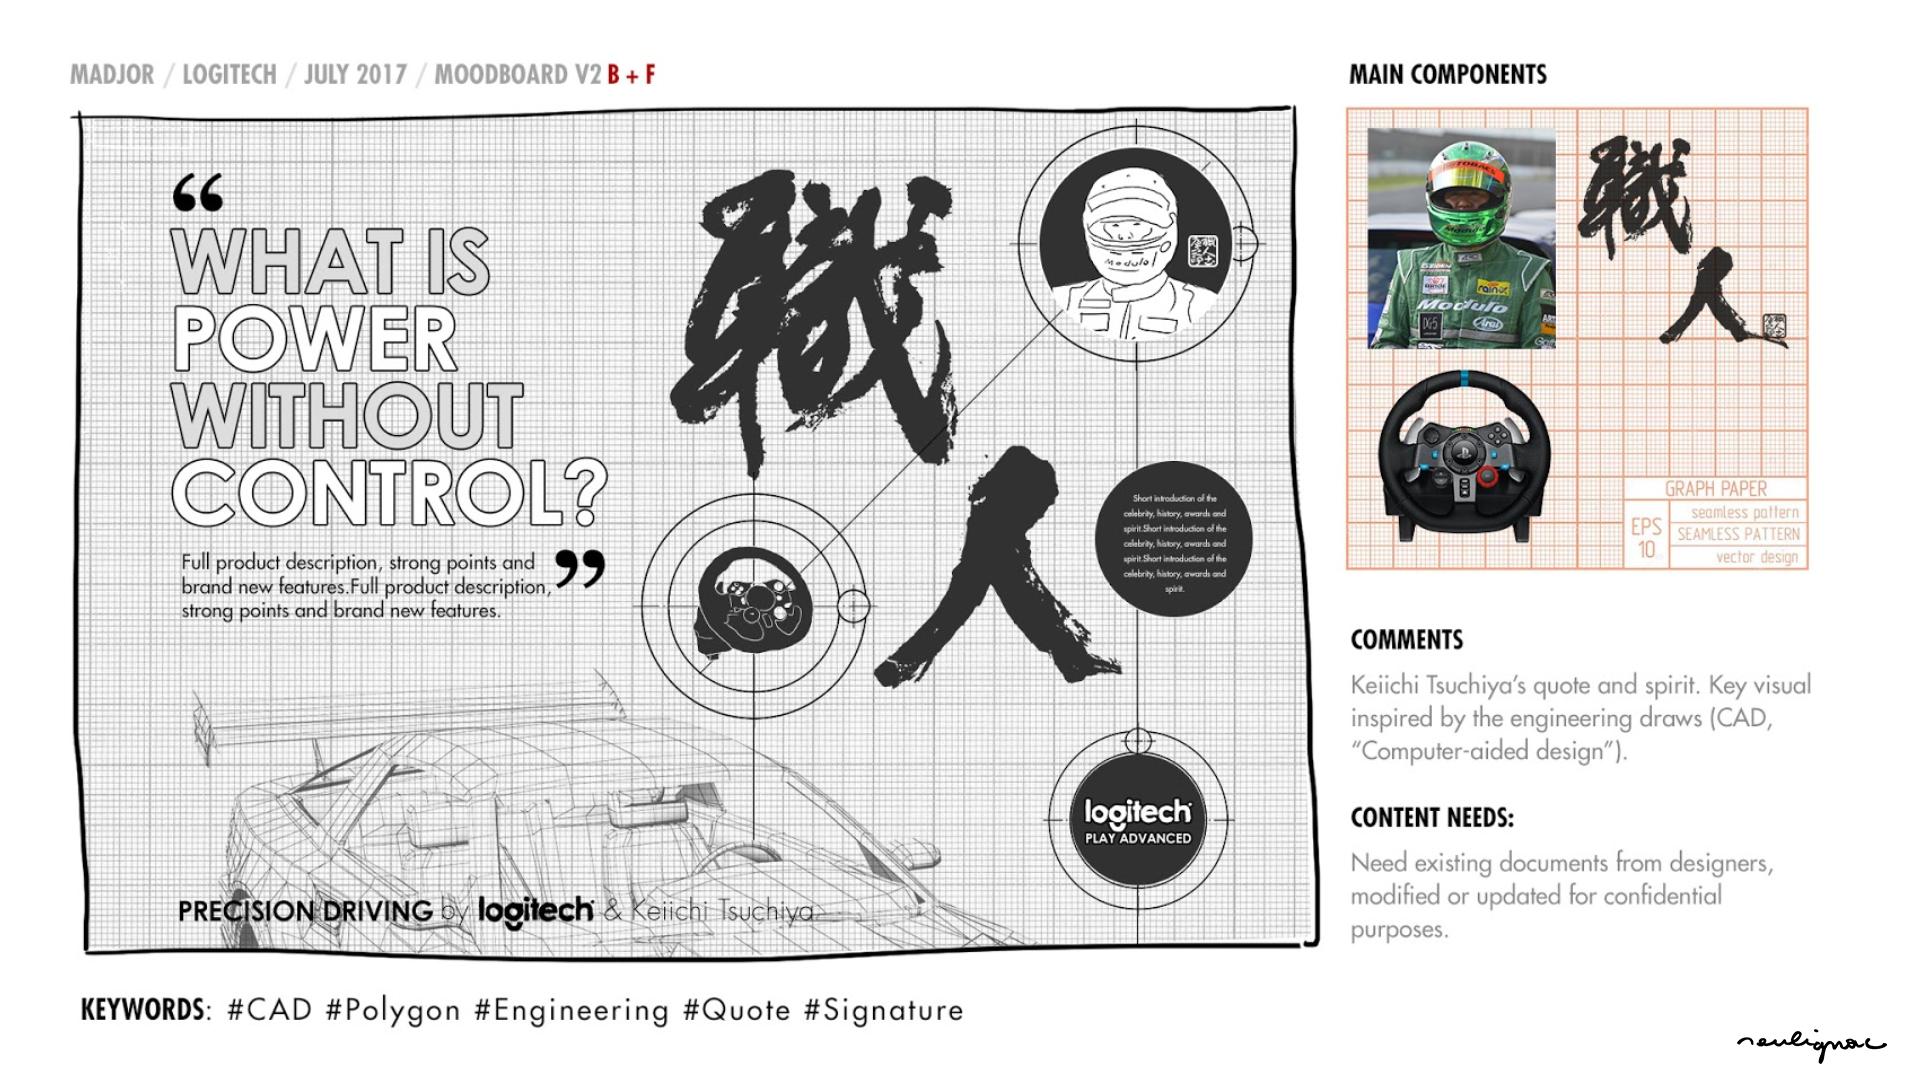 Logitech China - Global Campaign Keiichi Tsuchiya - WHAT IS POWER WITHOUT CONTROL - KEY VISUAL RESEARCHES & MOODBOARD - Francois Soulignac - Digital Creative & Art Direction - MADJOR Labbrand Shanghai, China